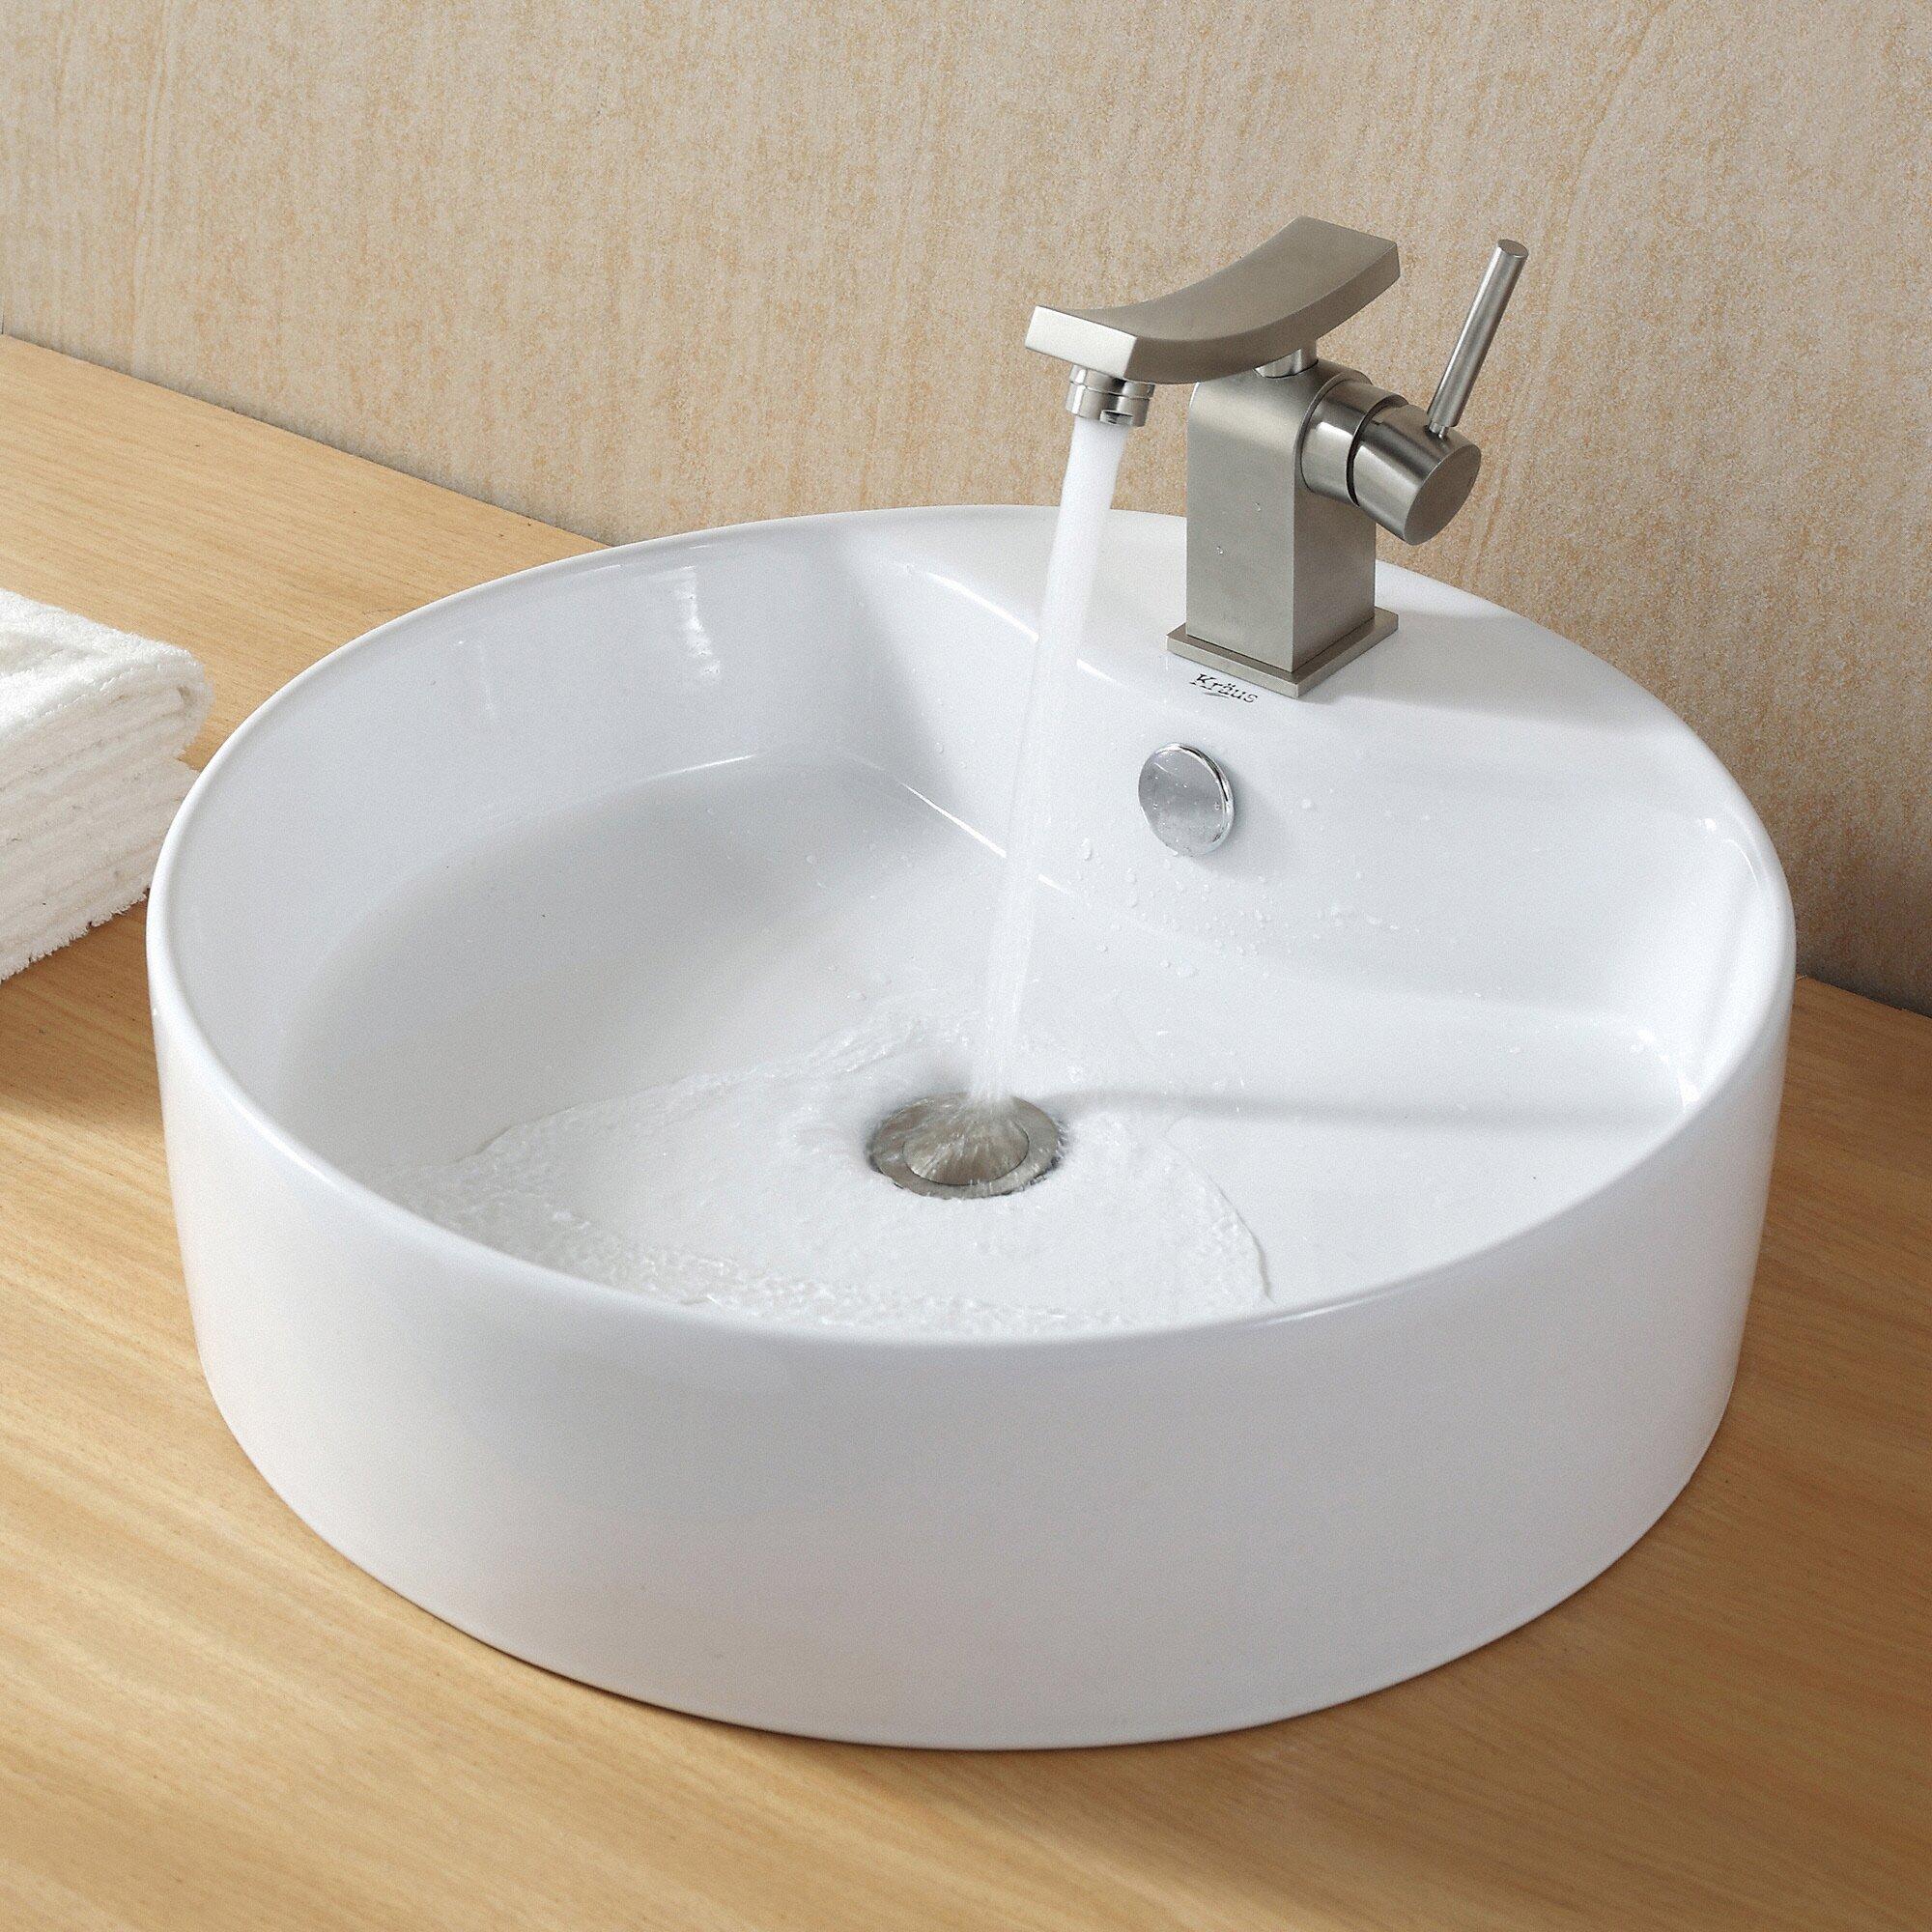 Kraus Sink Reviews : Kraus Ceramic Round Sink & Reviews Wayfair